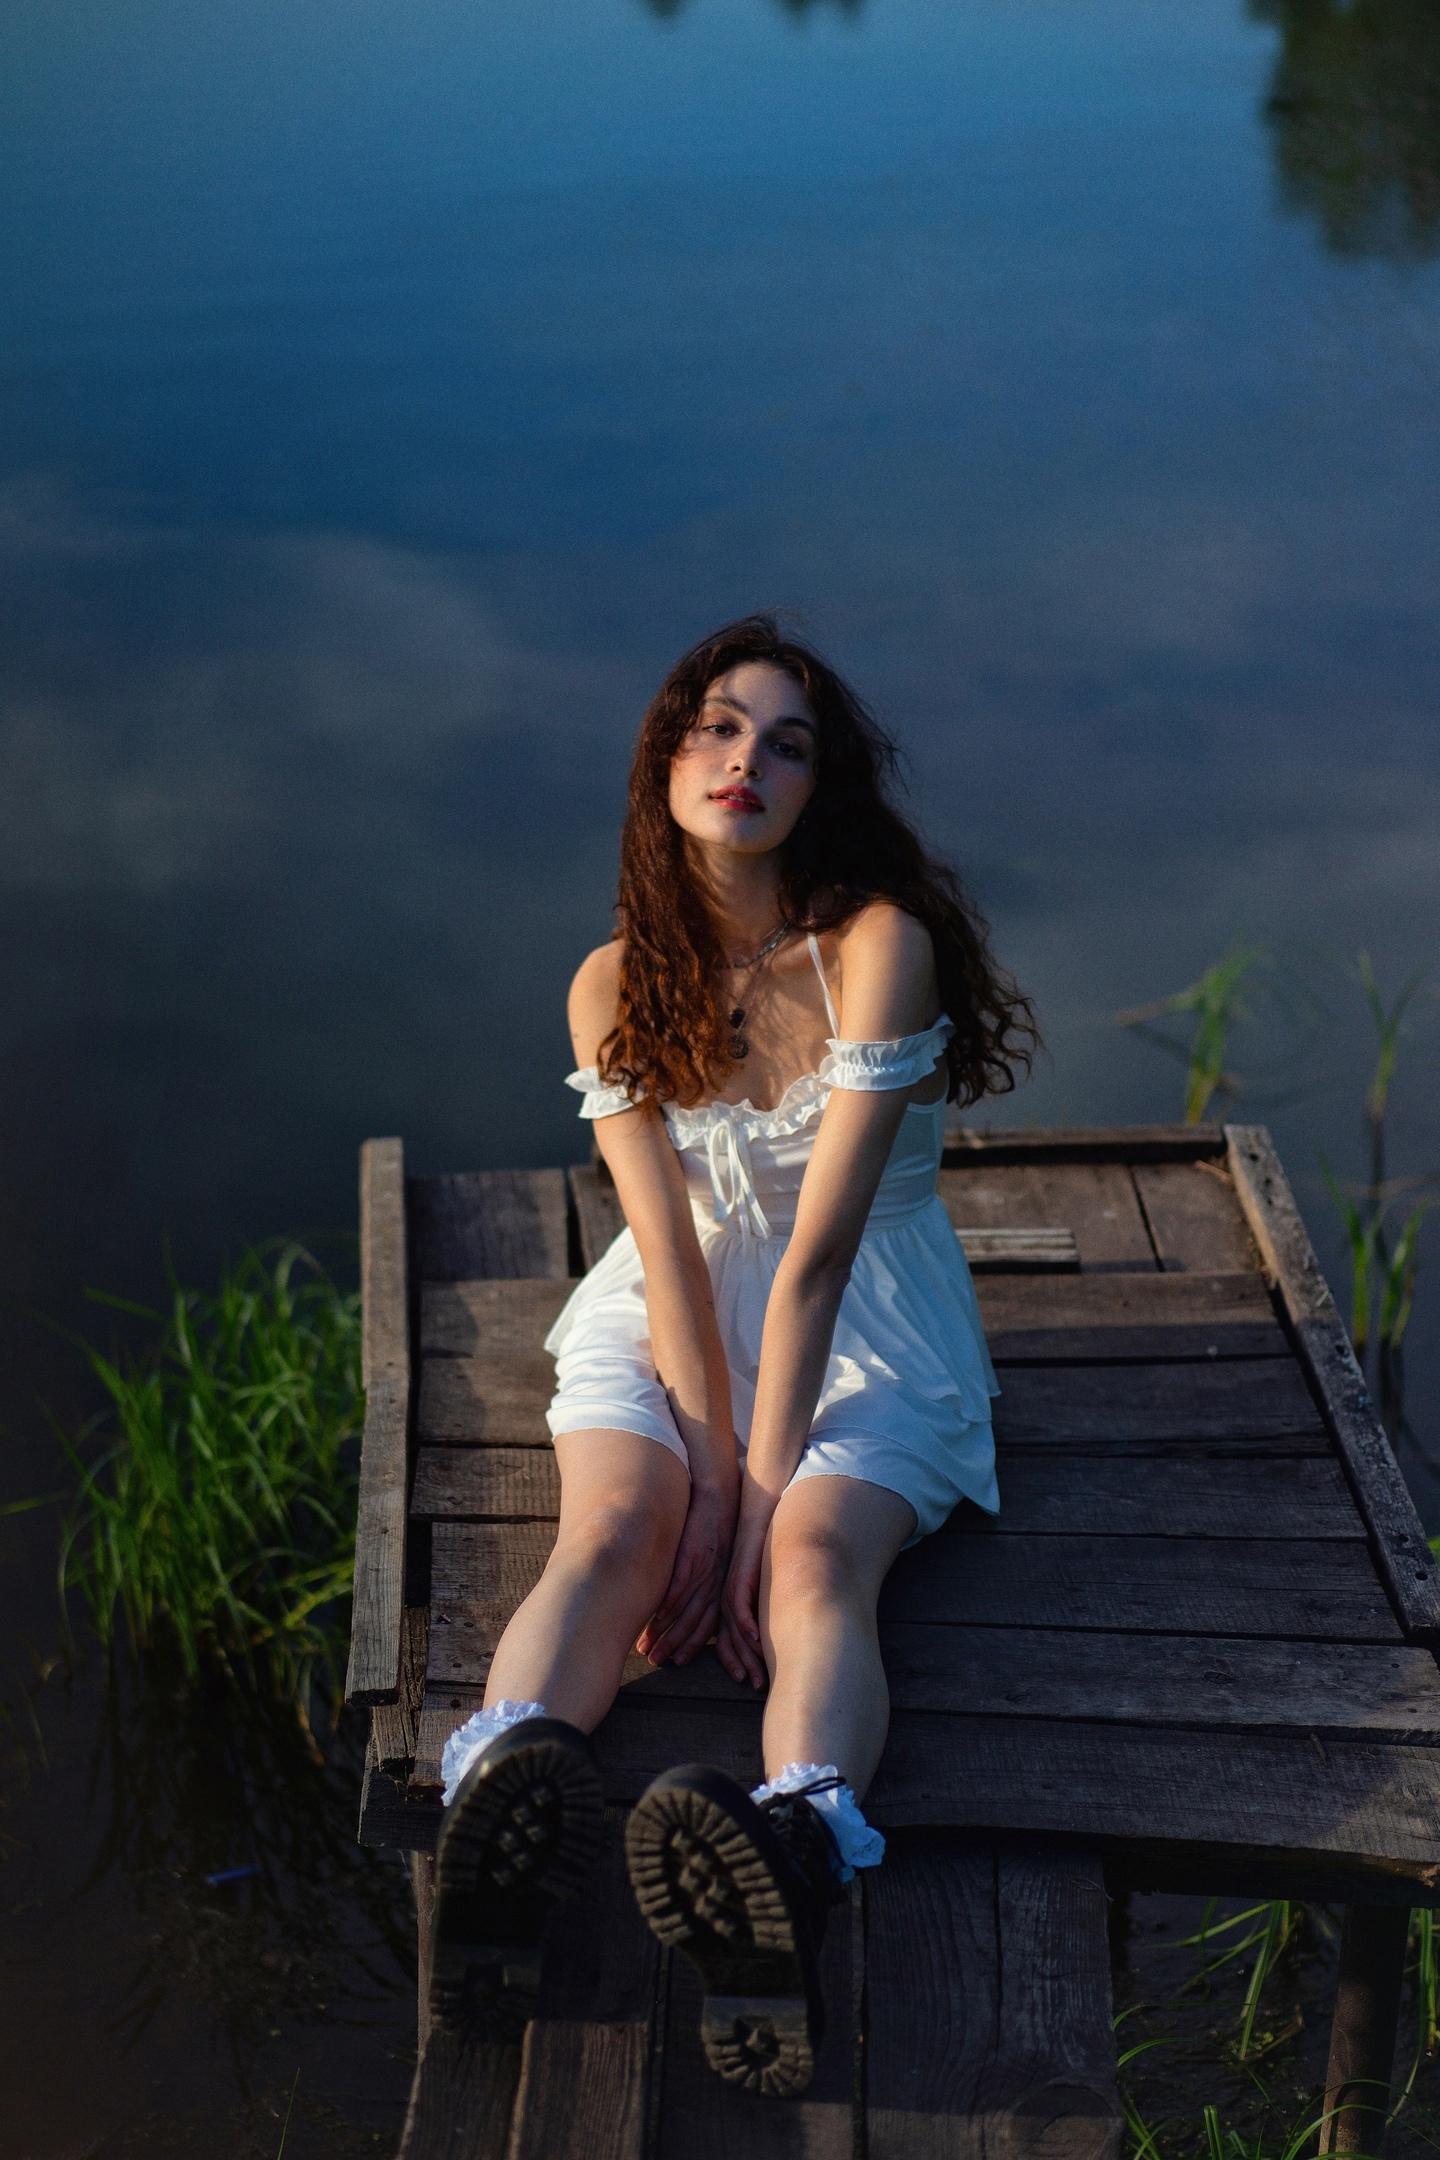 https://www.youngfolks.ru/pub/photographer-hella-good-112856